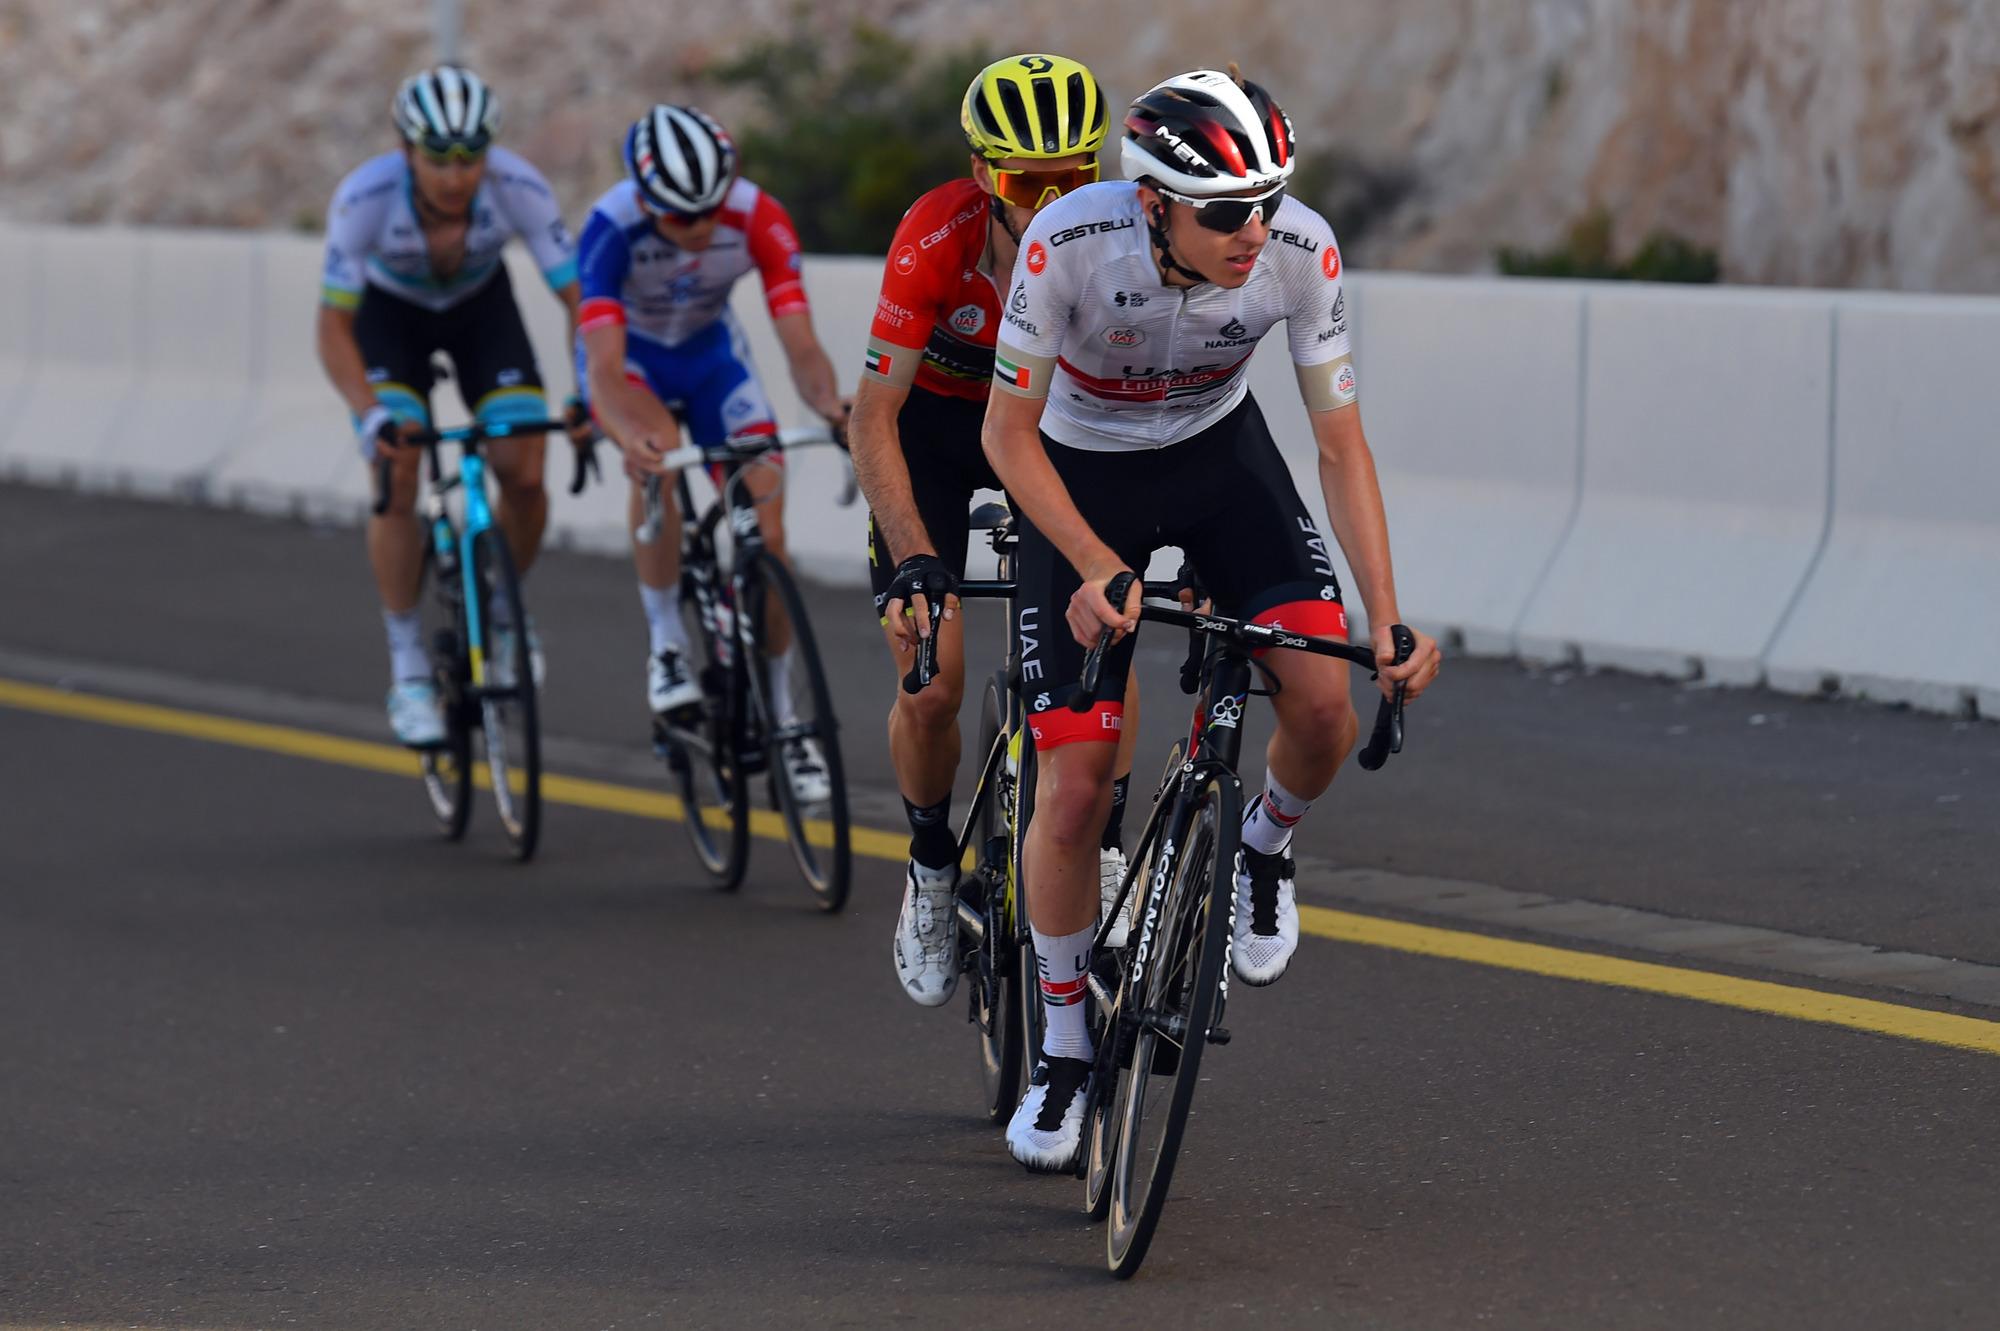 UAE Tour 2020 - 2nd Edition - 5th stage Al Ain - Jebel Hafeet 162 km - 27/02/2020 - Tadej Pogacar (SLO - UAE - Team Emirates) - Adam Yates (GBR - Mitchelton - Scott) - photo Dario Belingheri/BettiniPhoto©2020